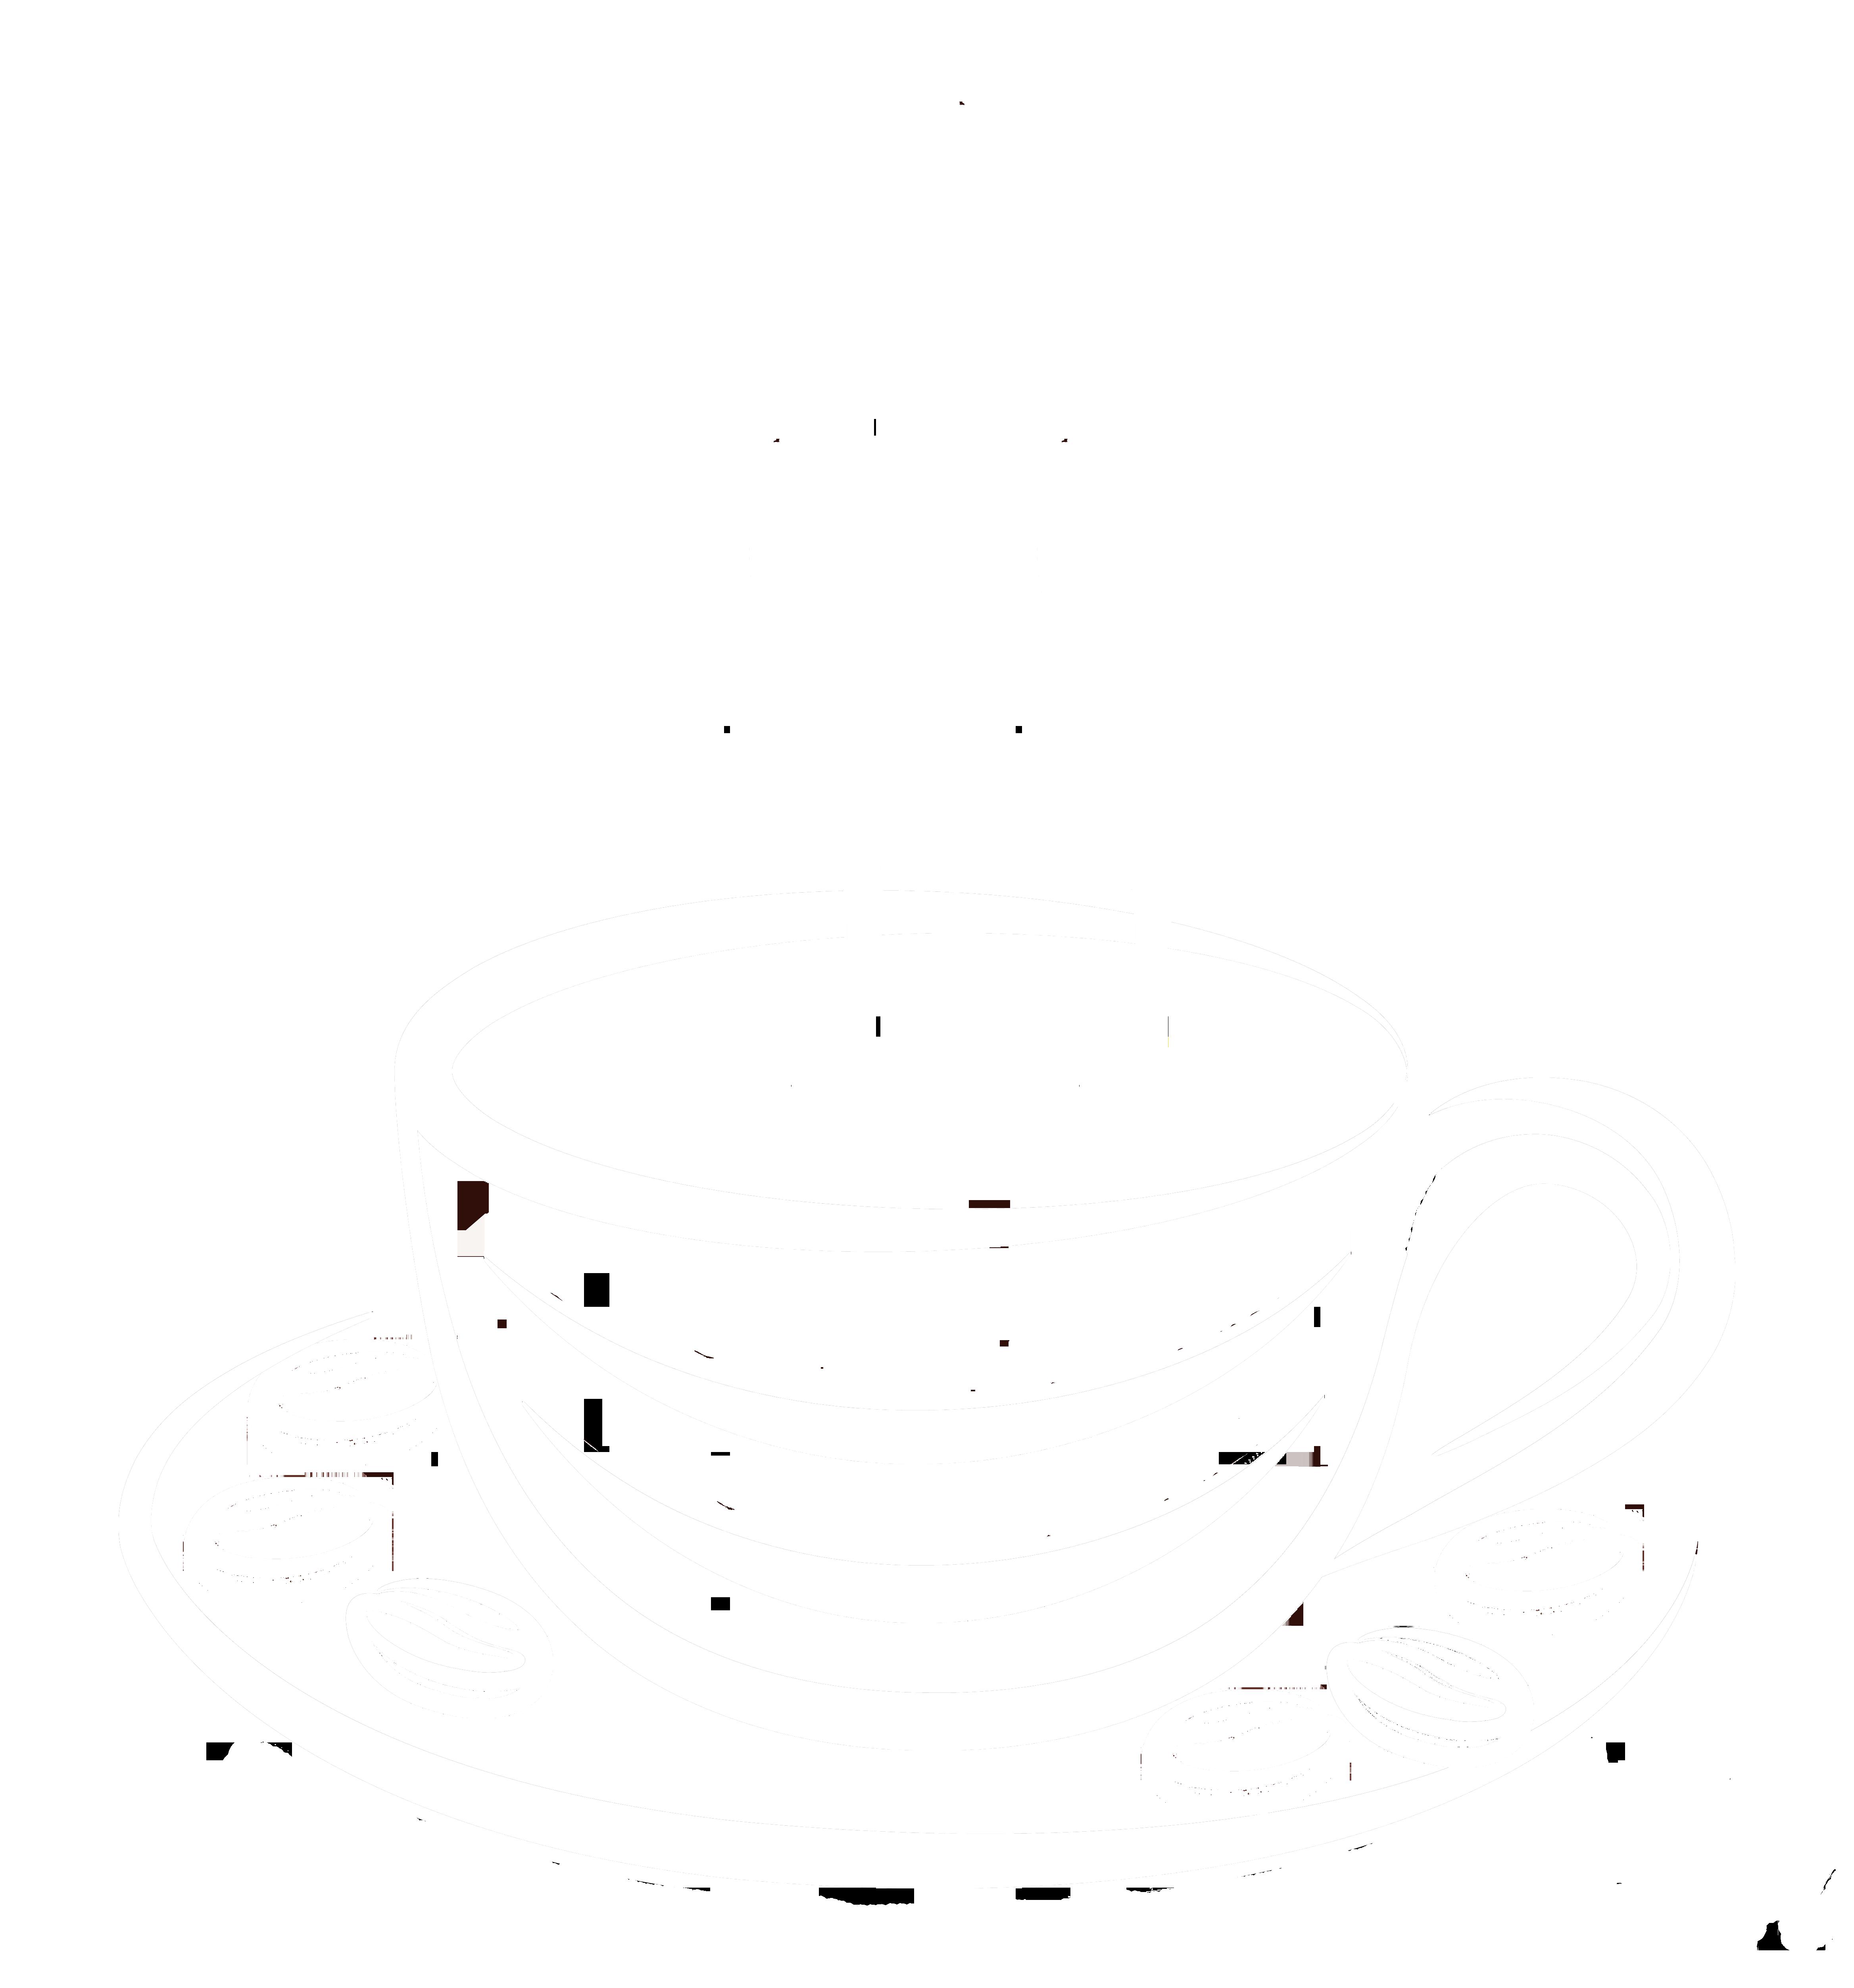 Usa fresh roast whole. Clipart cup coffee group